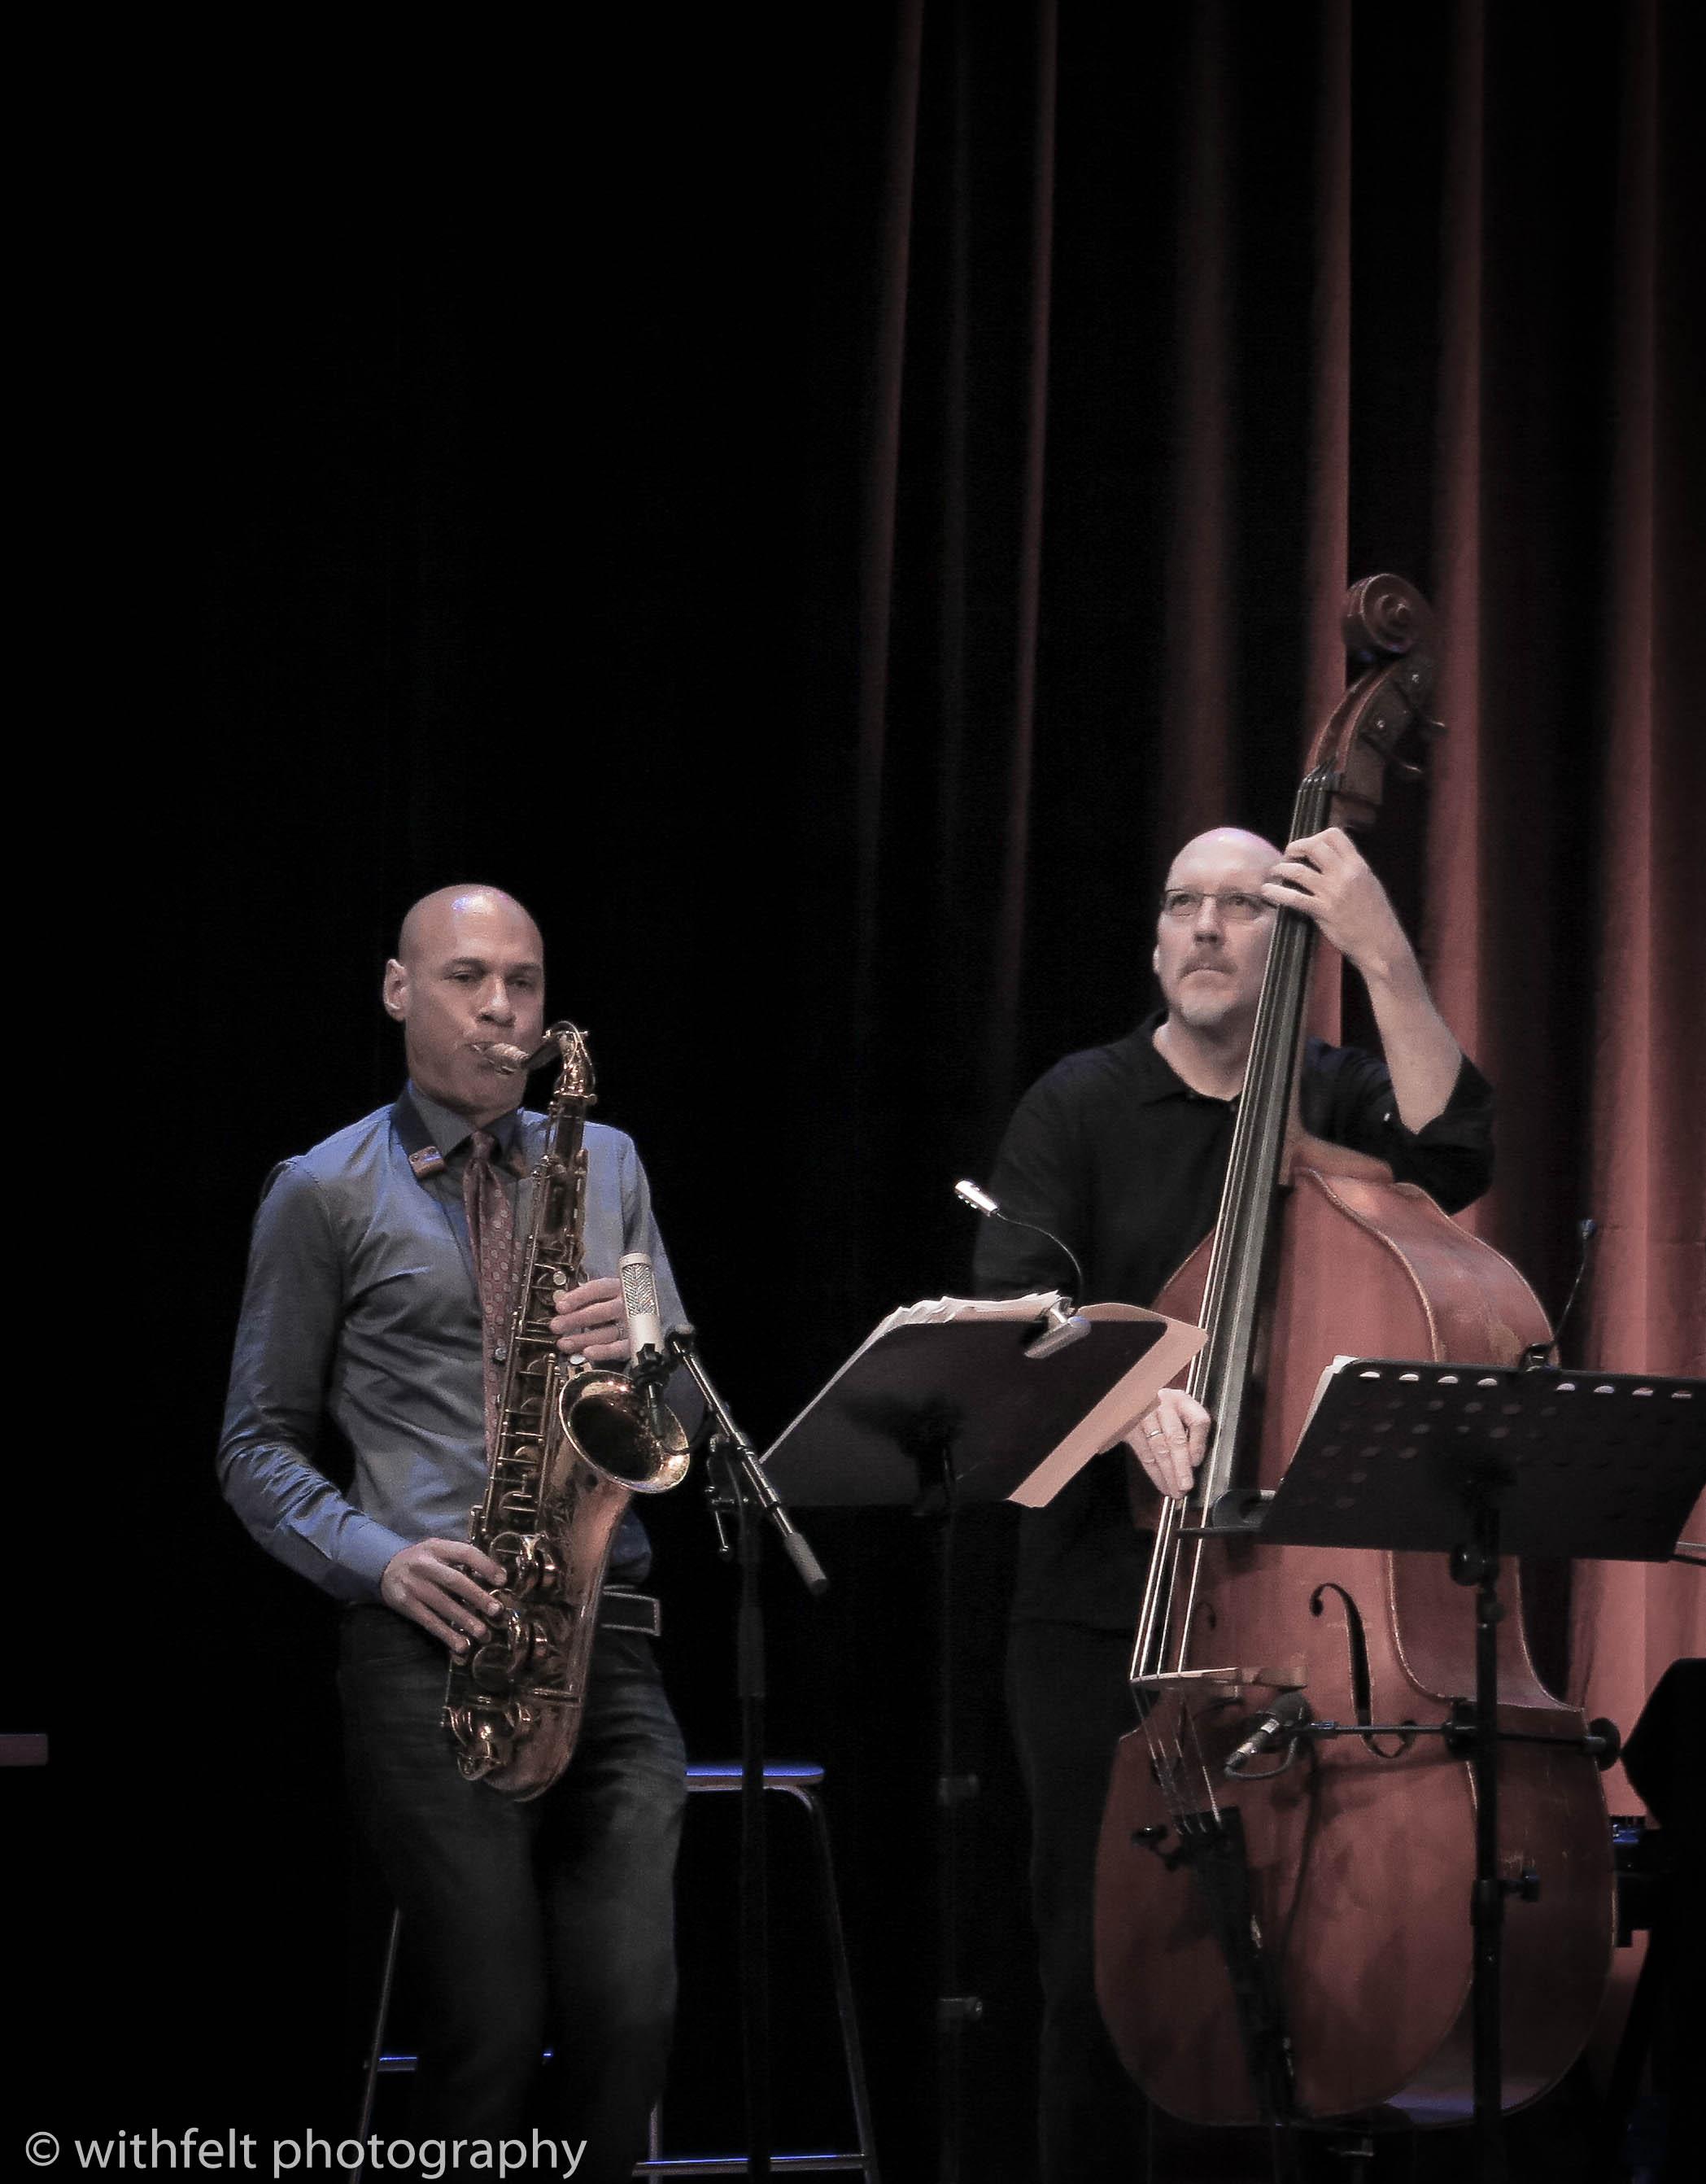 Joshua Redman & Scott Colley at Summer Jazz 2019, Copenhagen, Denmark